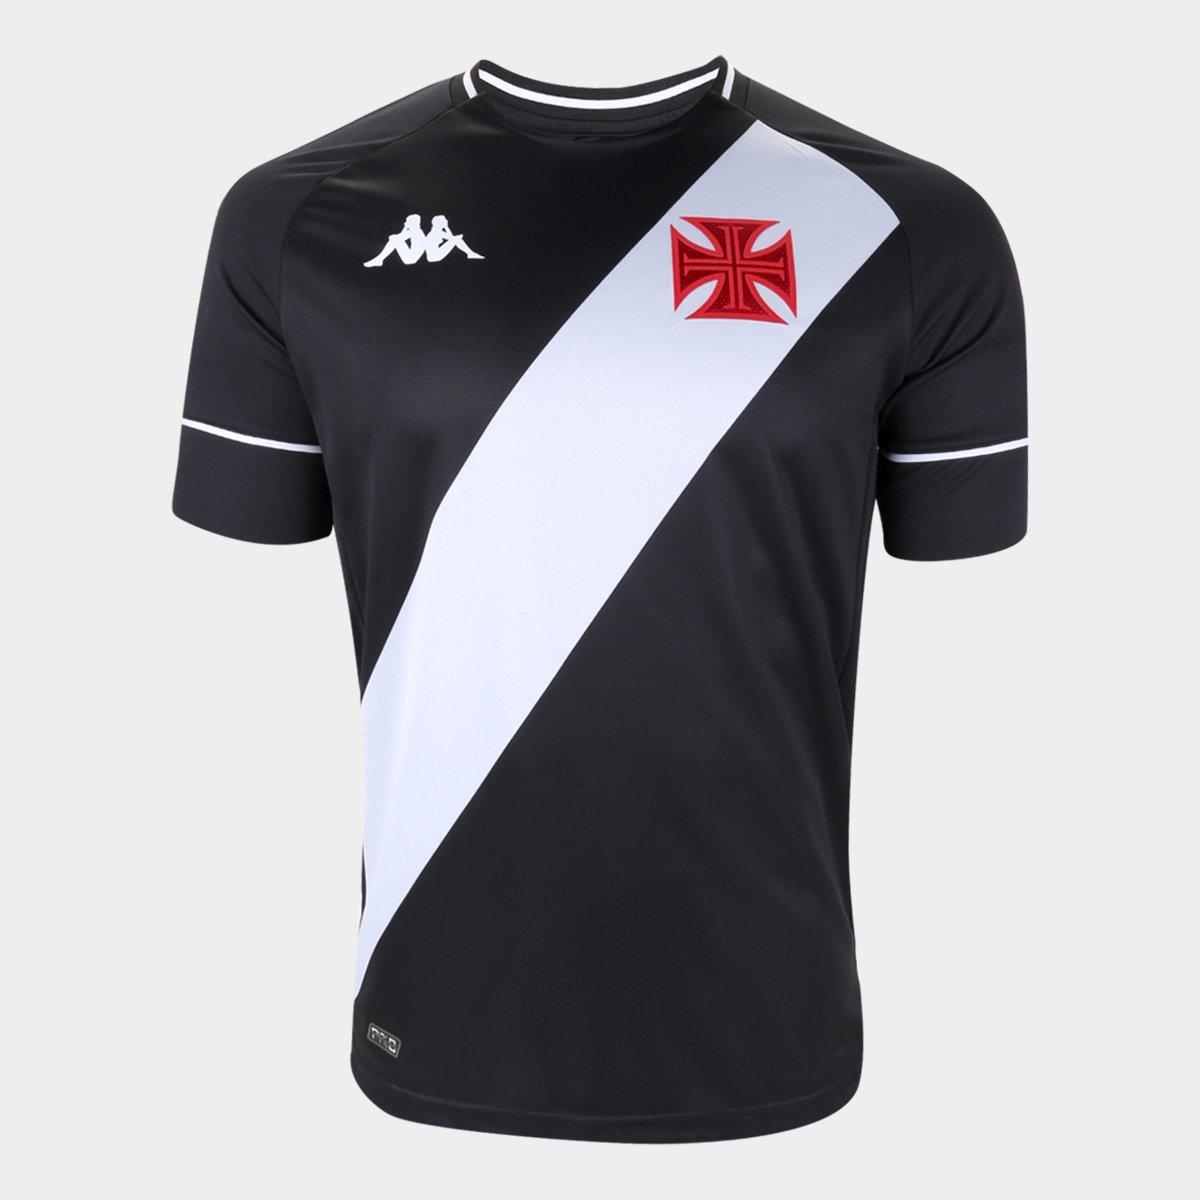 Camisa Vasco I Kappa 2020/2021 - Castán #Kappanovasco